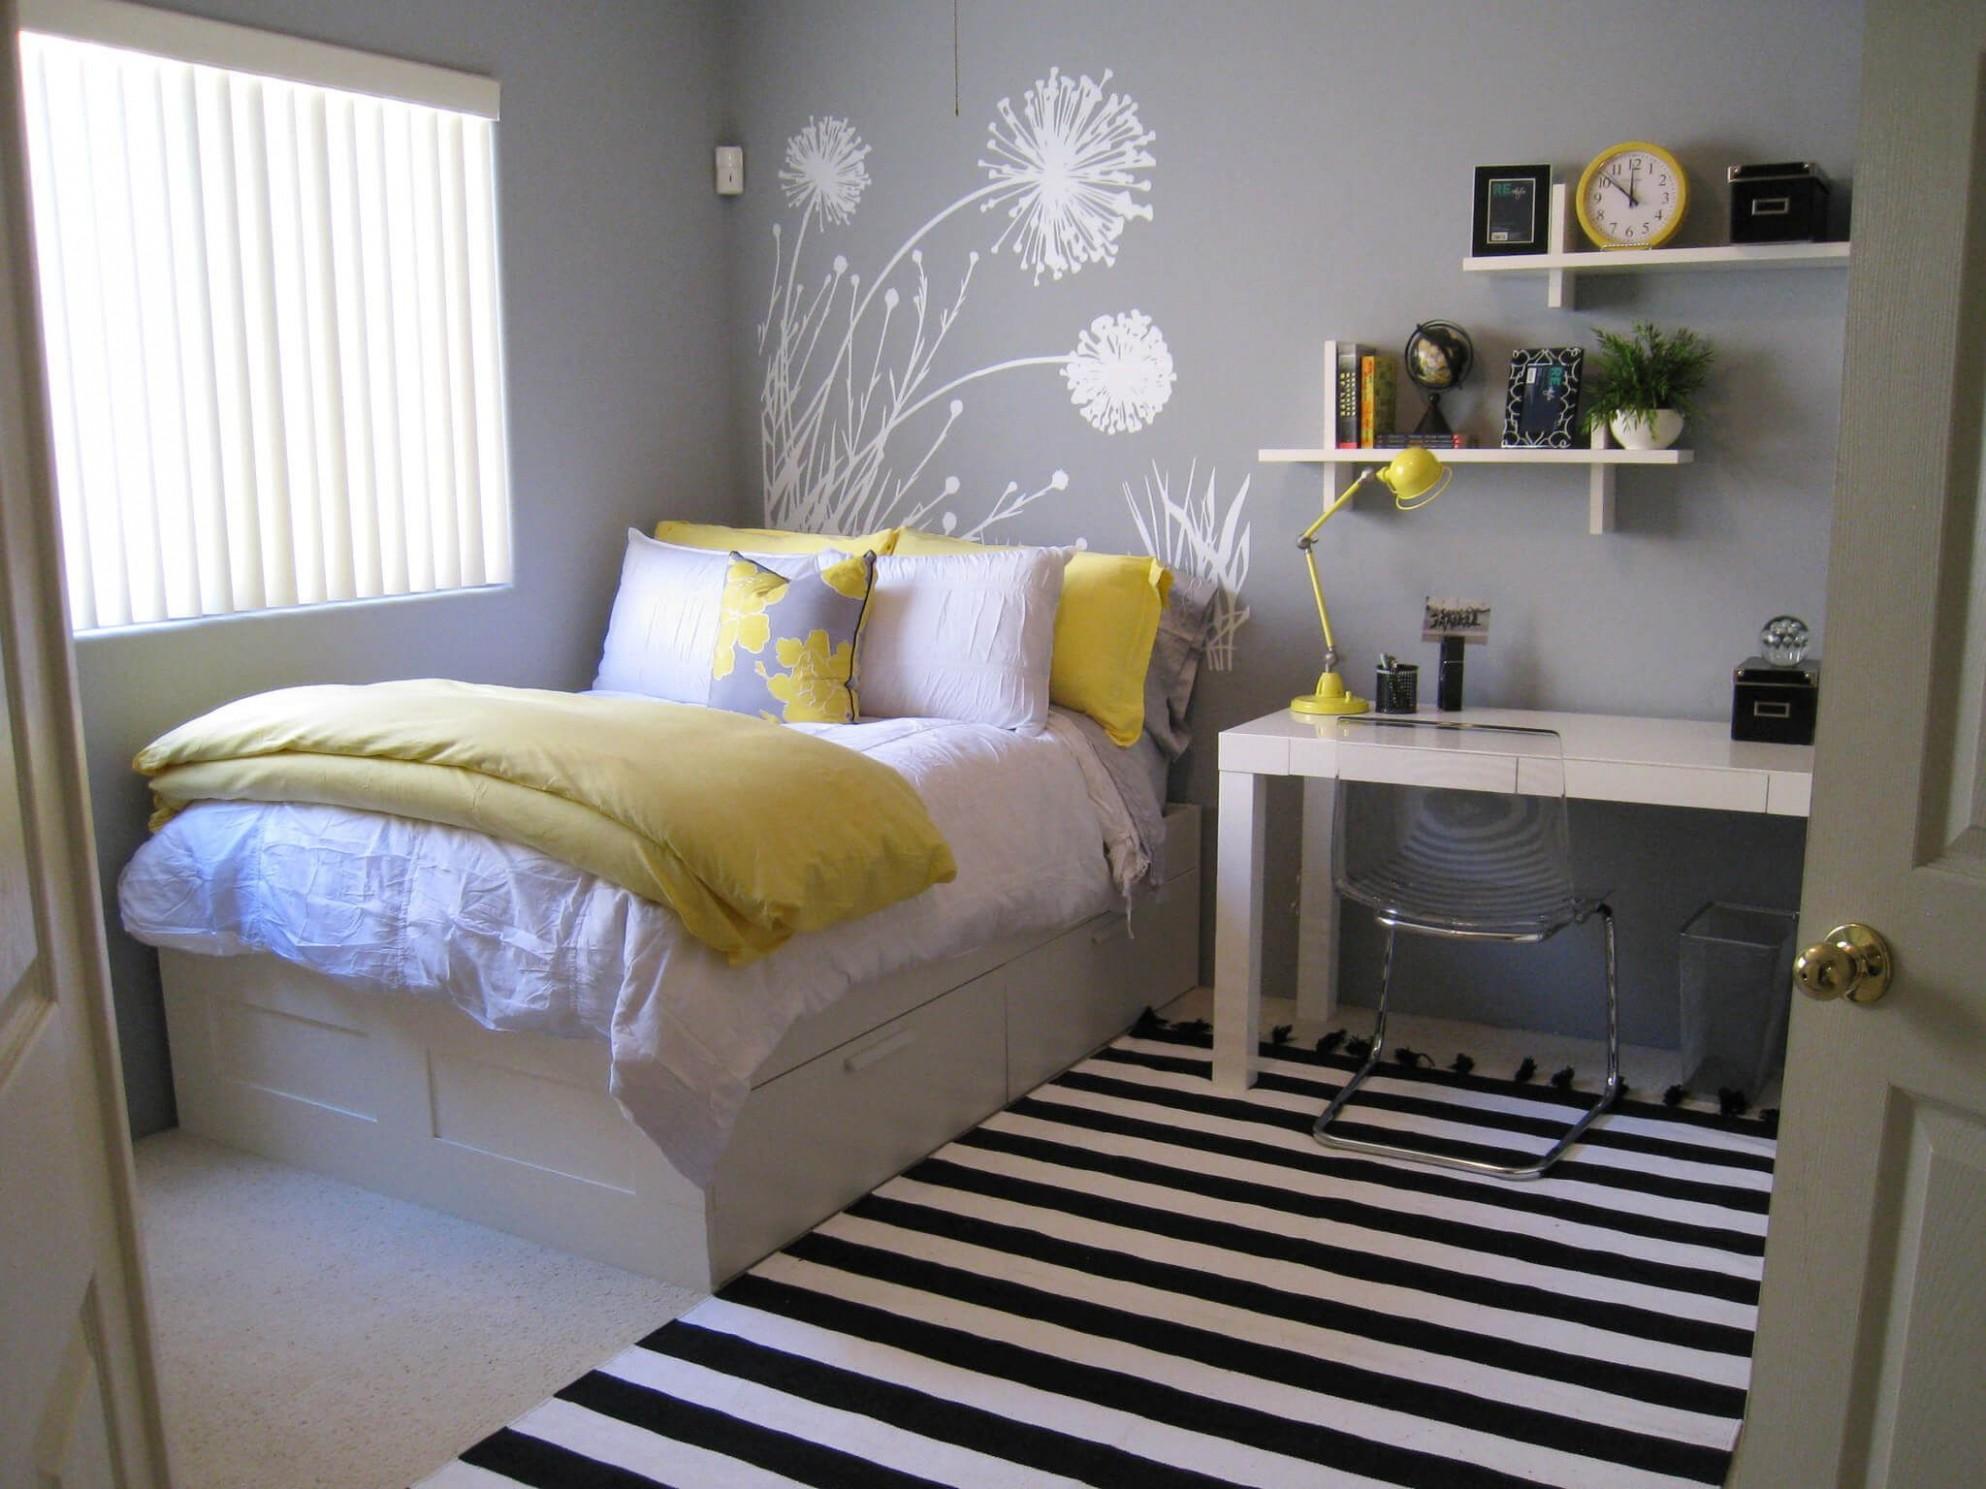 Pin on guestroom - Bedroom Ideas Small Room